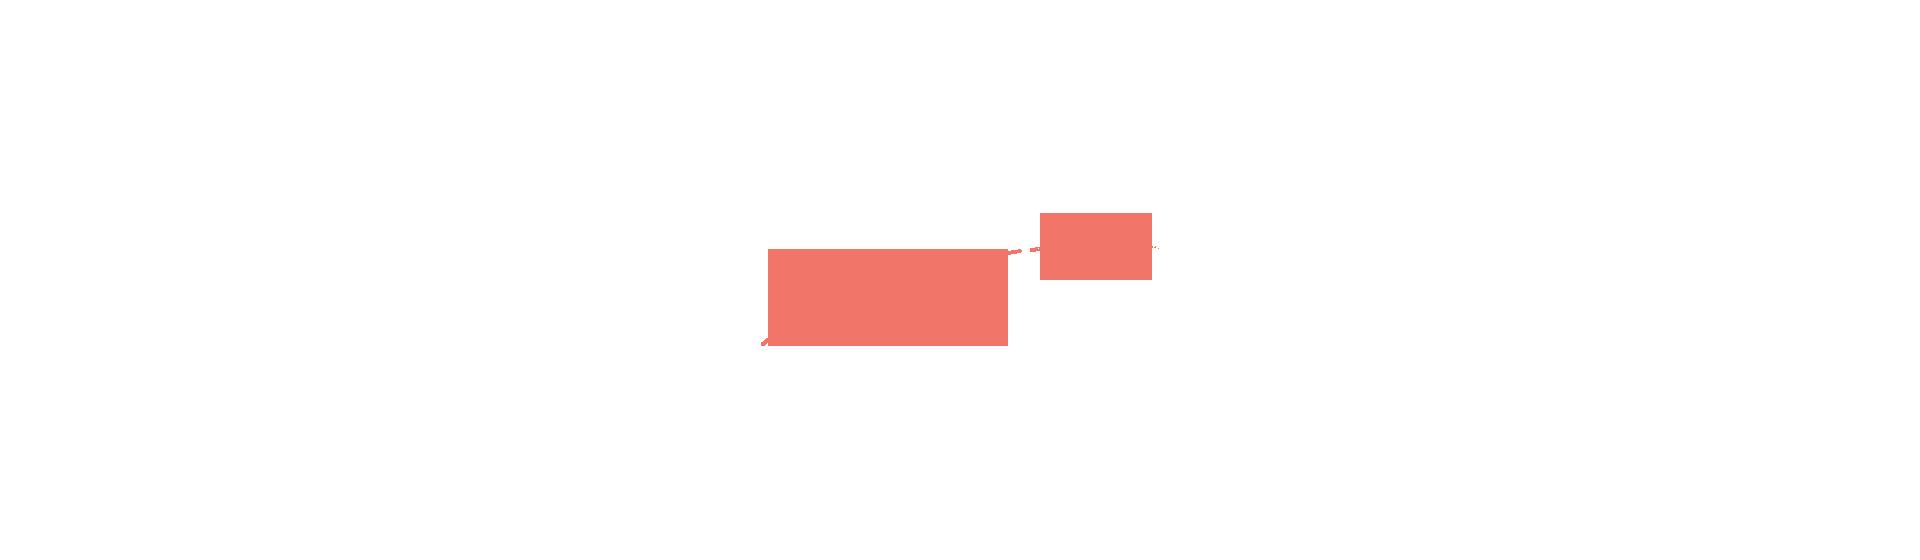 airplane logo from awheelinthesky.com